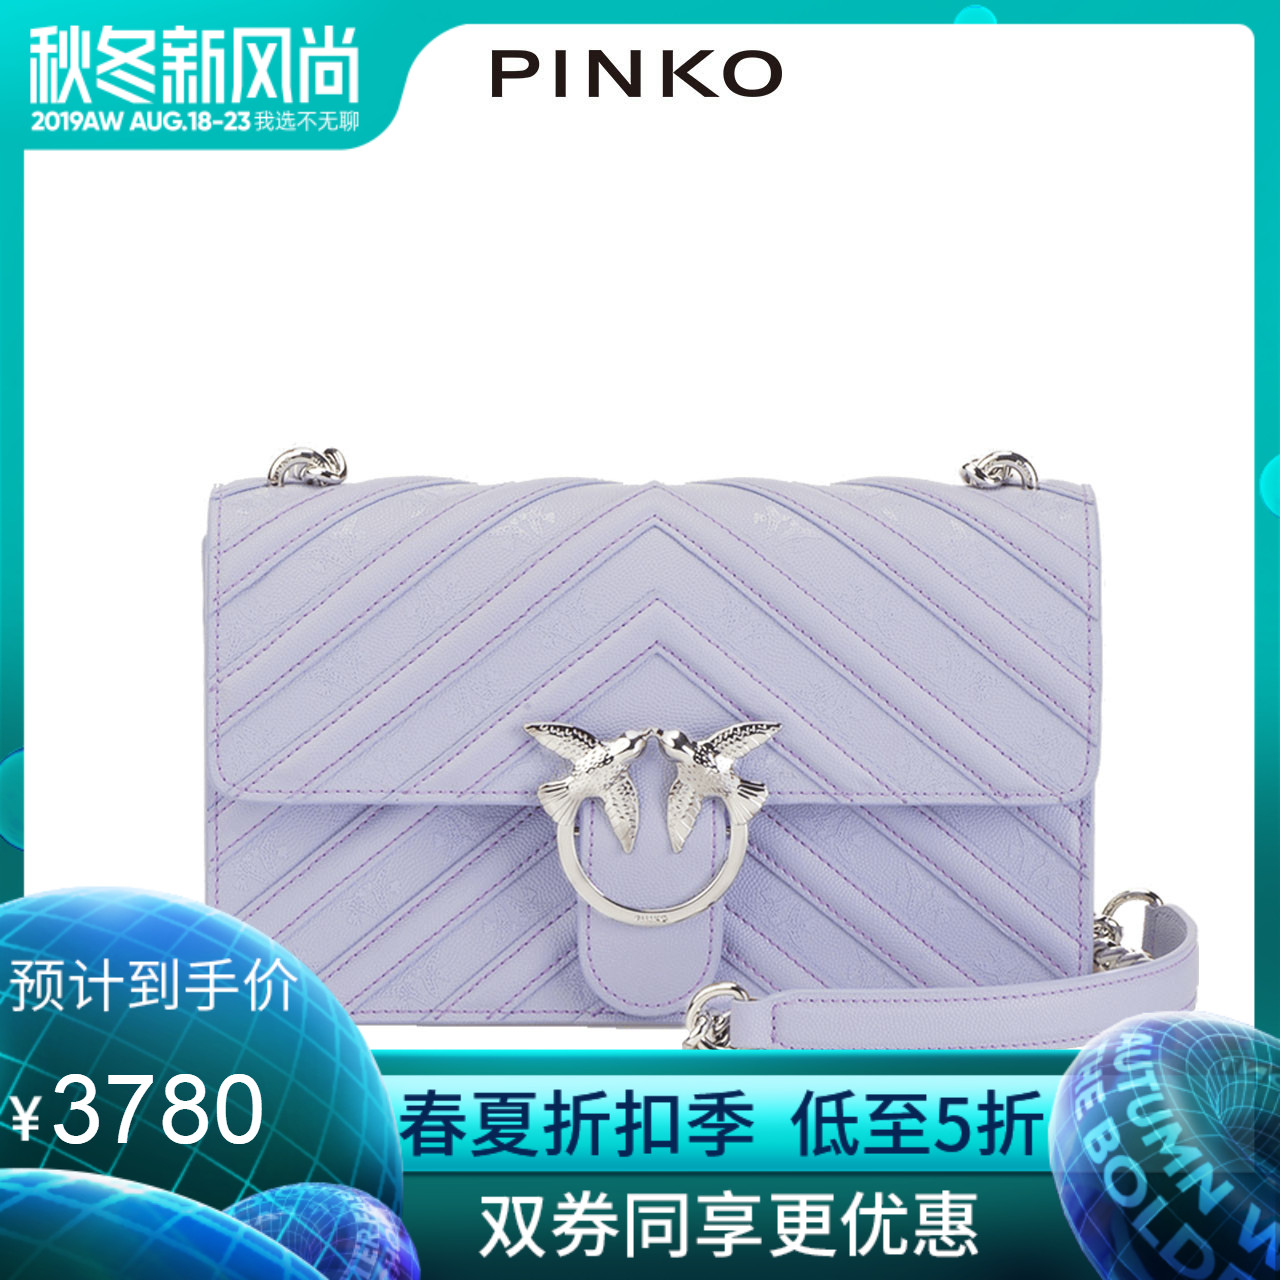 PINKO2019春夏新品立體印花條紋飛鳥包燕子包LOVE BAG 1P21A9Y5F3